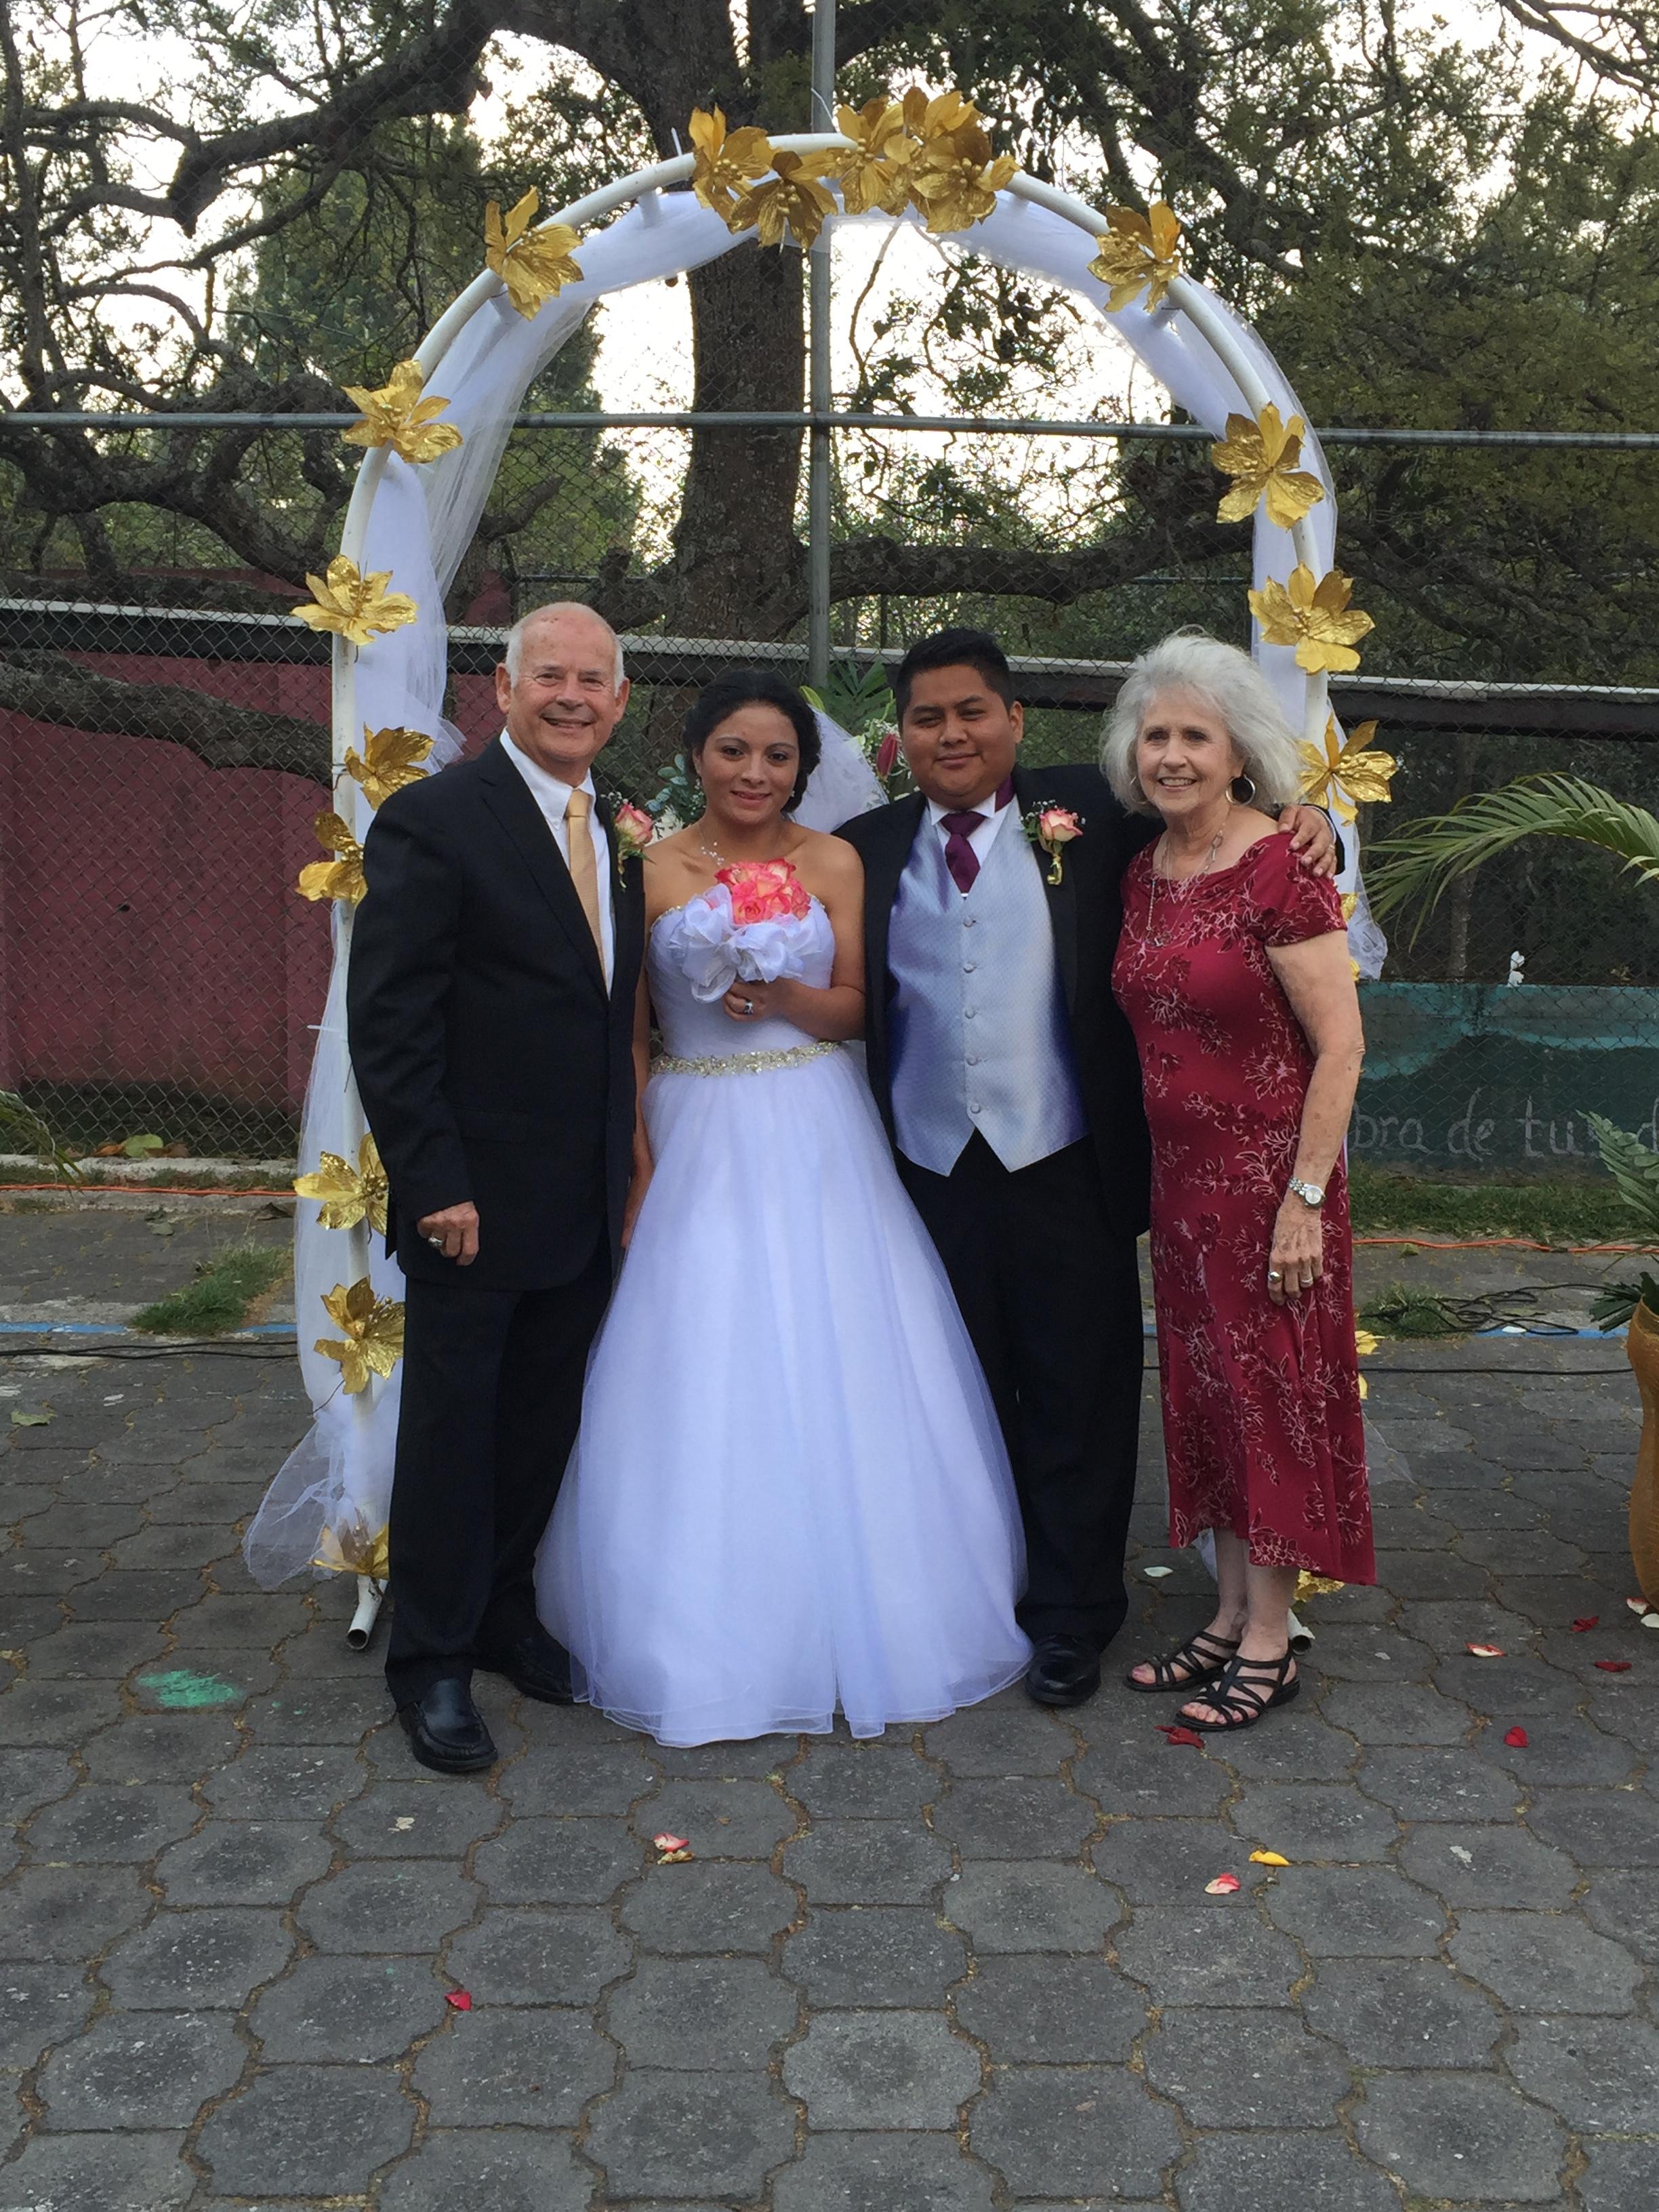 Senor & Senora Jacob Ortiz Chanoy